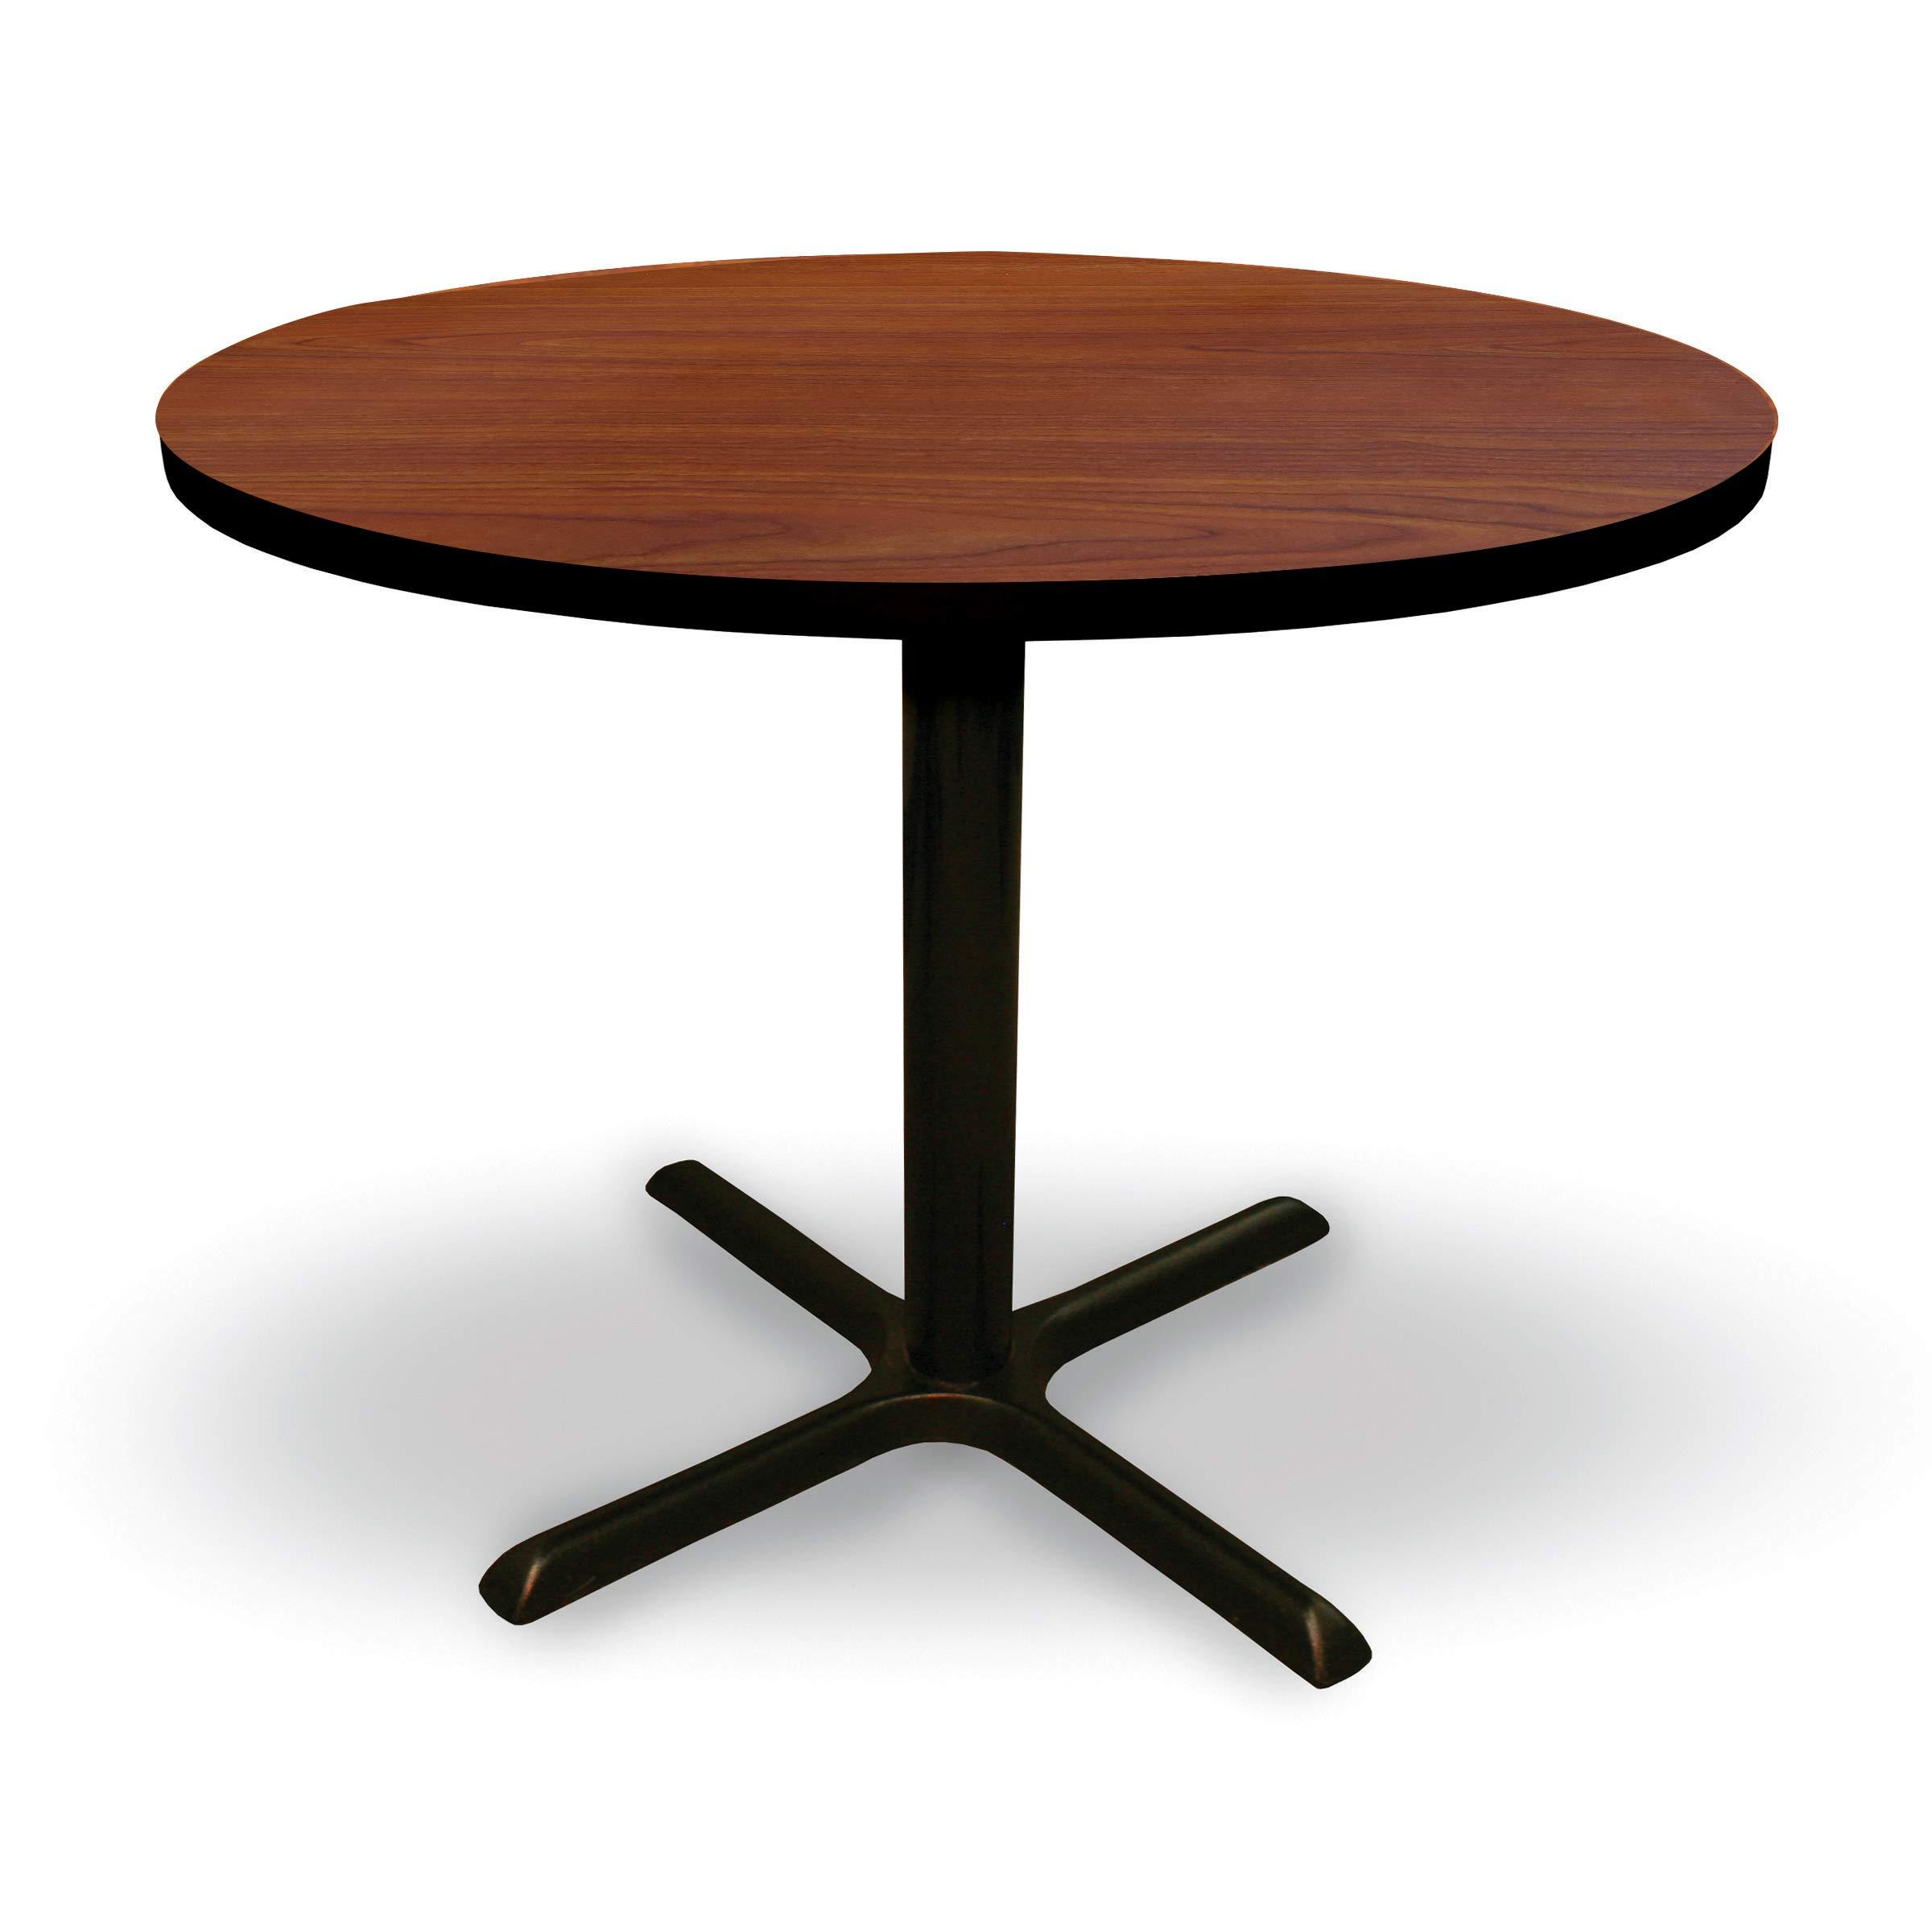 36'' Round Conference, Break Room, Multipurpose Table - Collectors Cherry Laminate/Black Finish